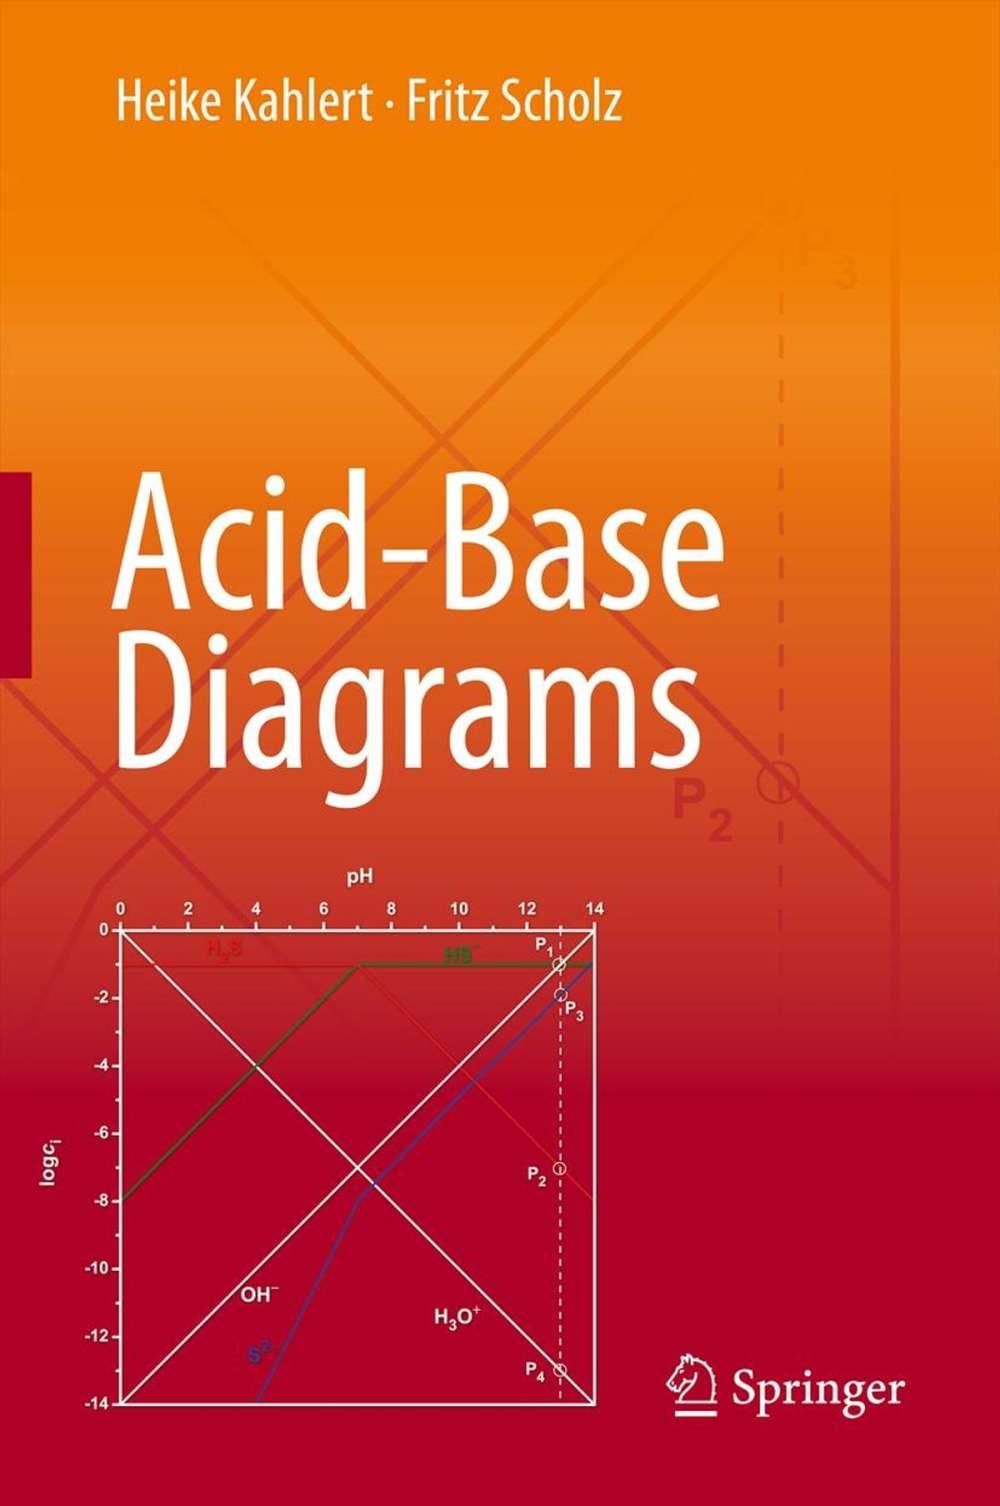 medium resolution of acid base diagrams ebook por heike kahlert 9783642379024 rakuten kobo